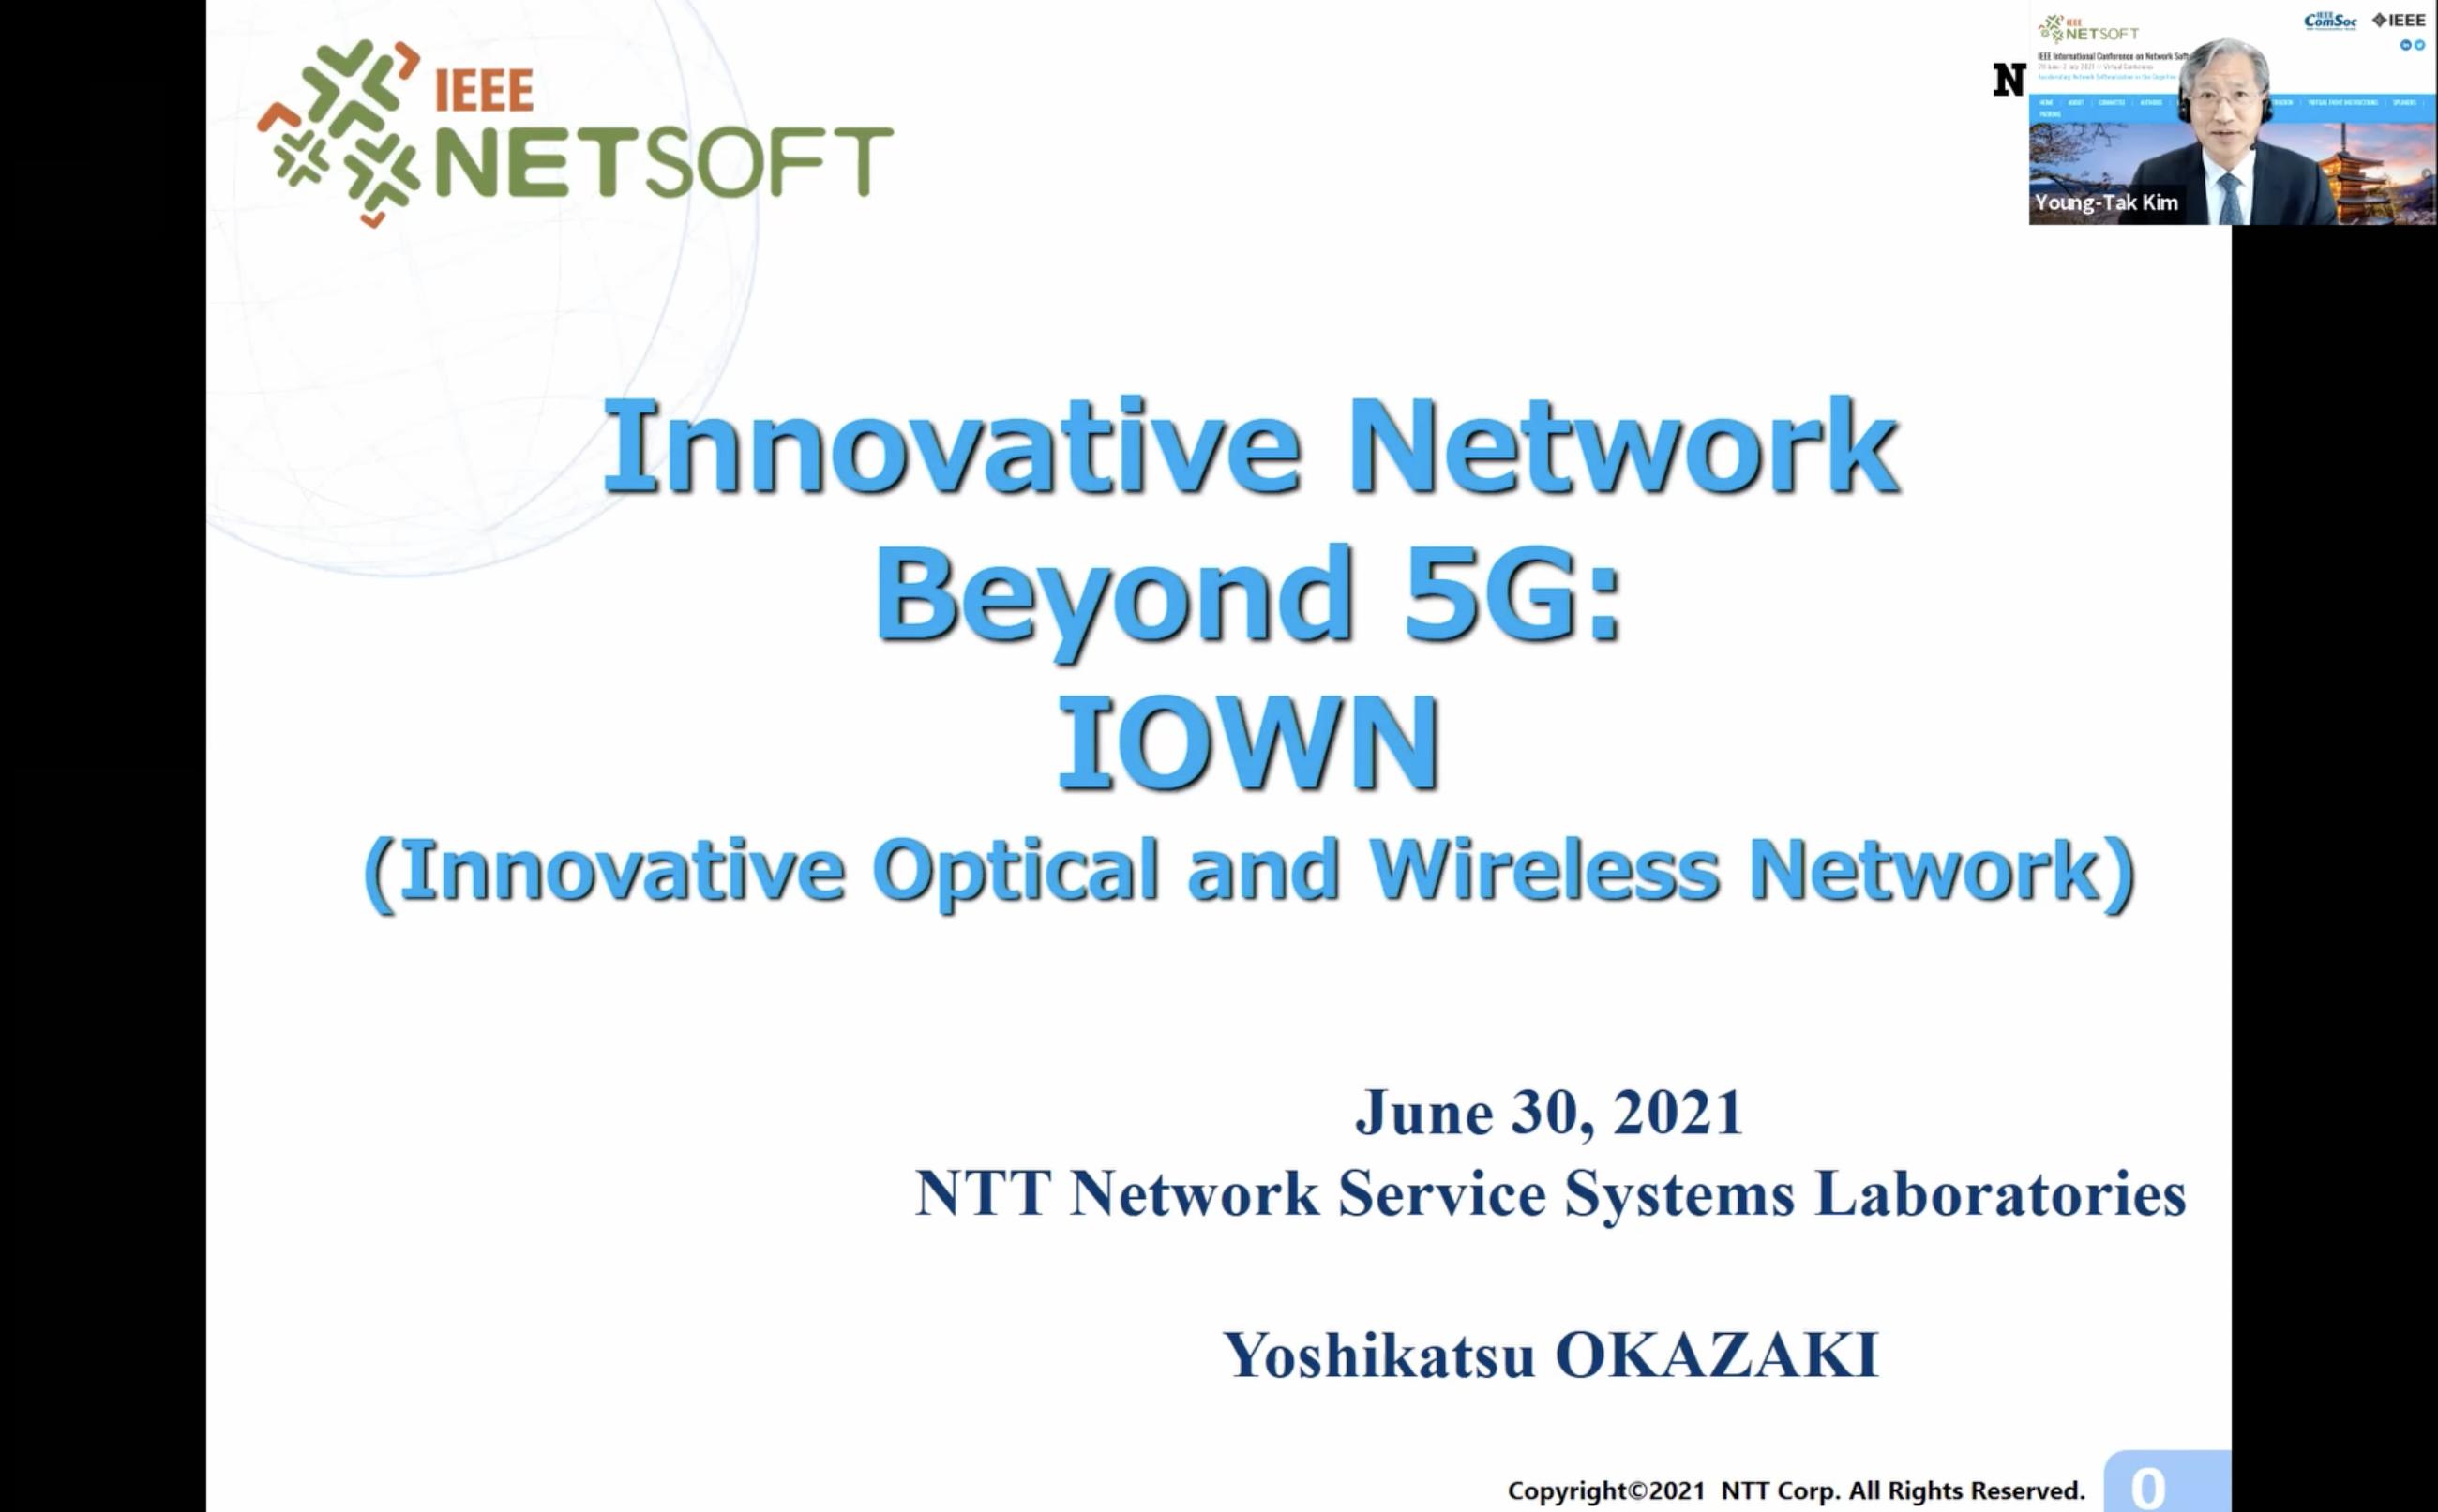 NetSoft 2021 - Keynote 3: Innovative Network Beyond 5G : IOWN